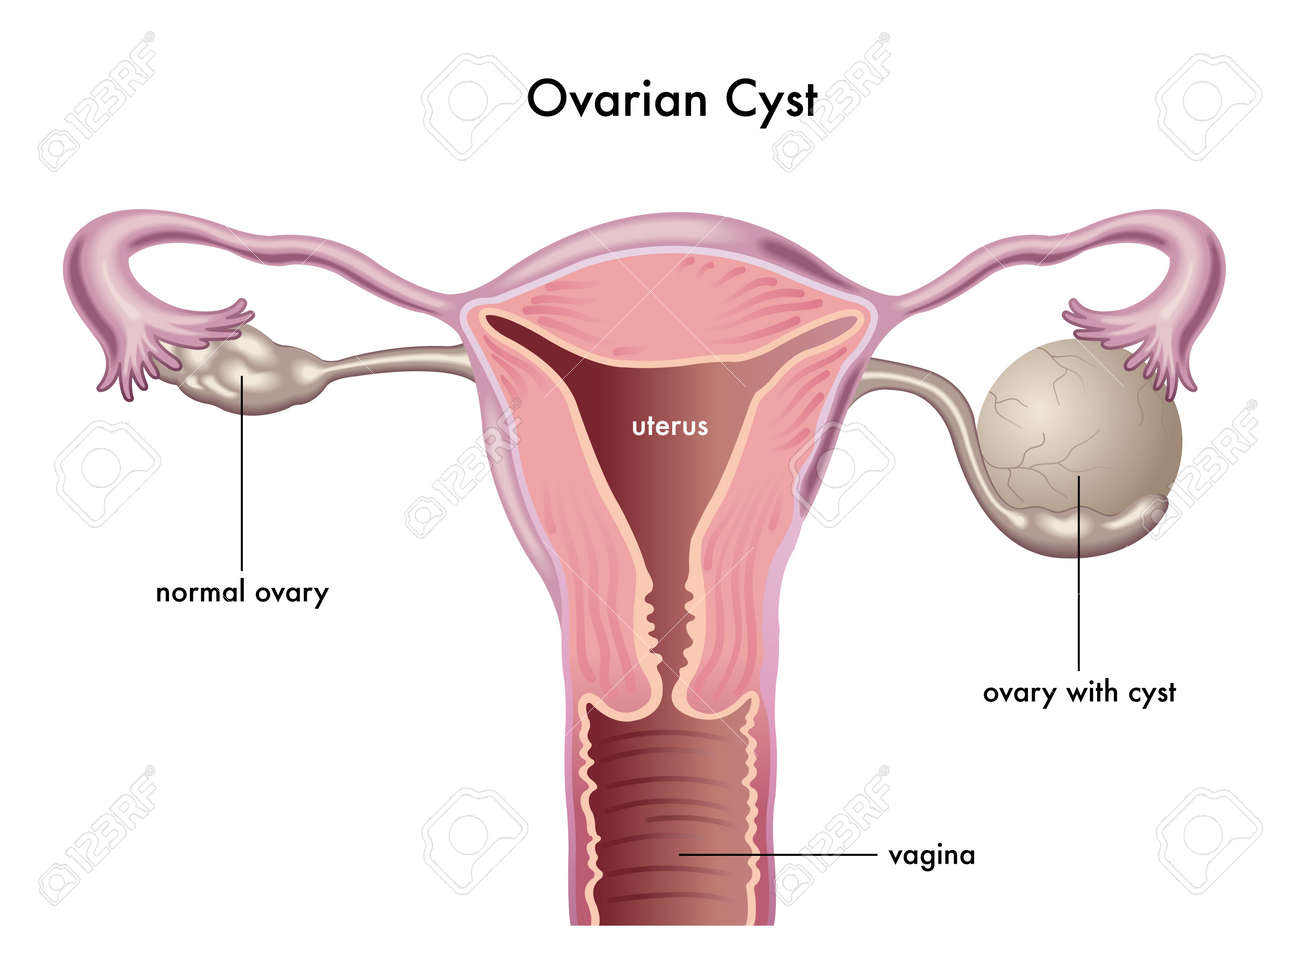 ovarian cyst - 40657966